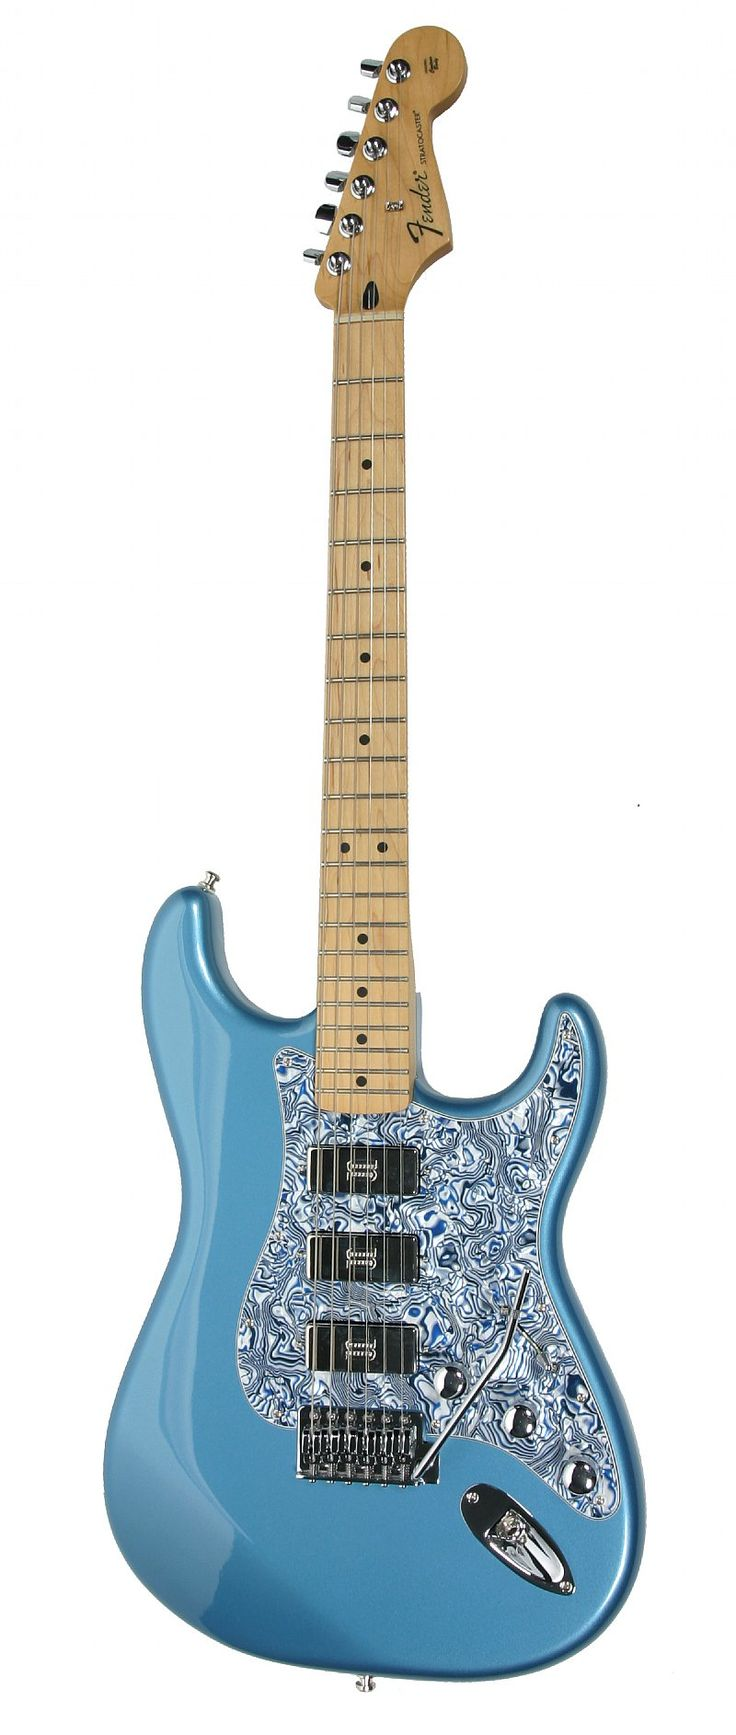 920D Mod Standard MIM Strat Custom Electric Guitar with Seymour Duncan SM-3 Mini Humbuckers